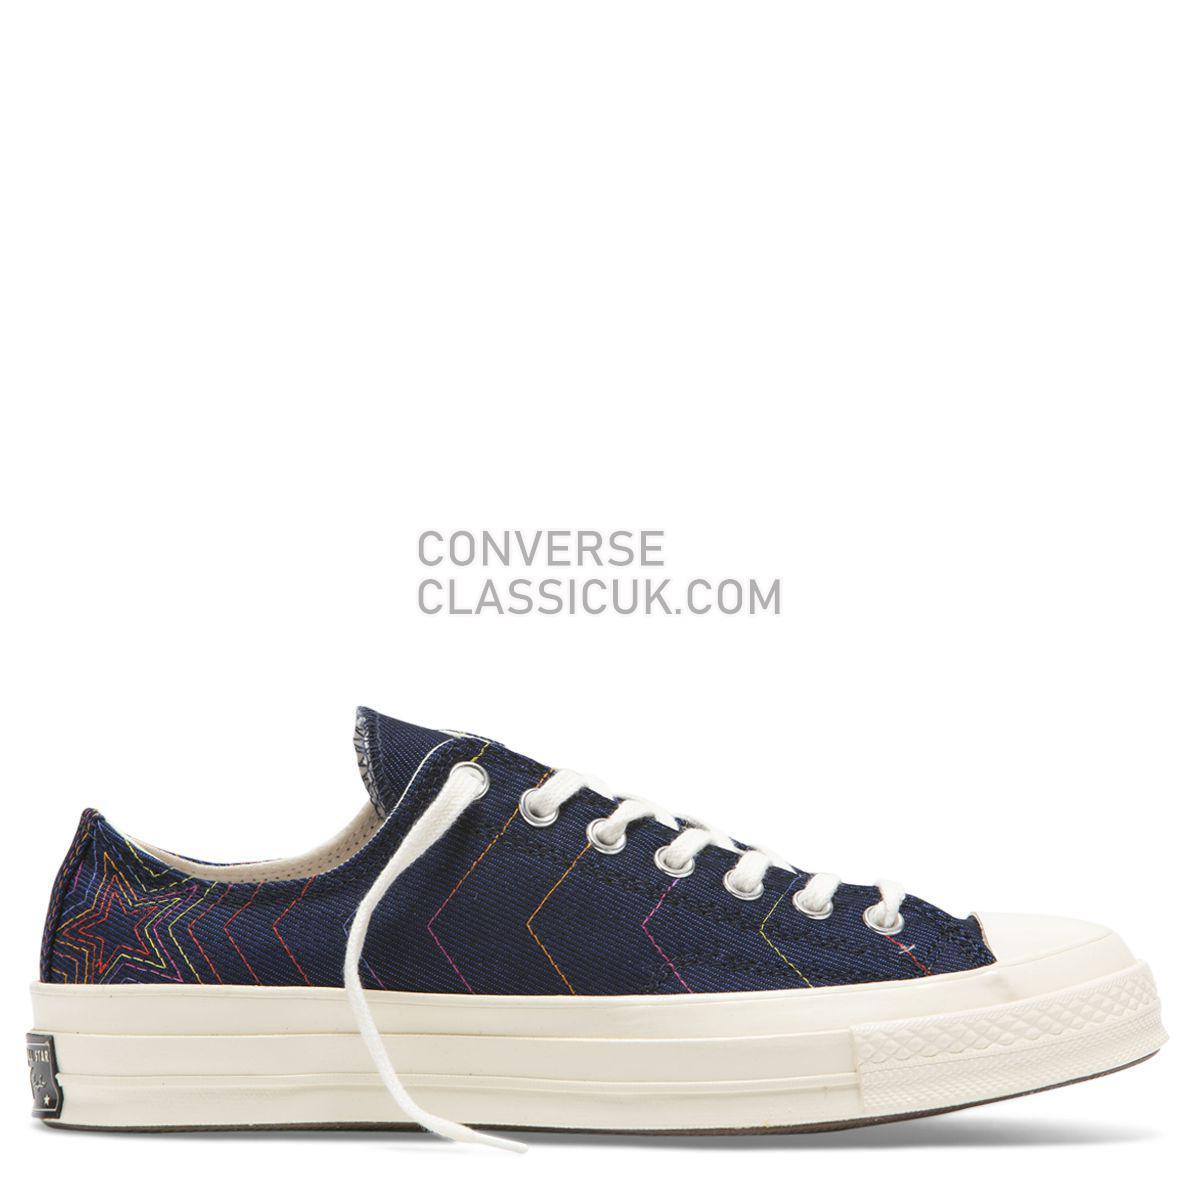 Converse Chuck Taylor All Star 70 Rainbow Low Top Obsidian Mens Womens Unisex 164967 Obsidian/Ozone Blue/Egret Shoes